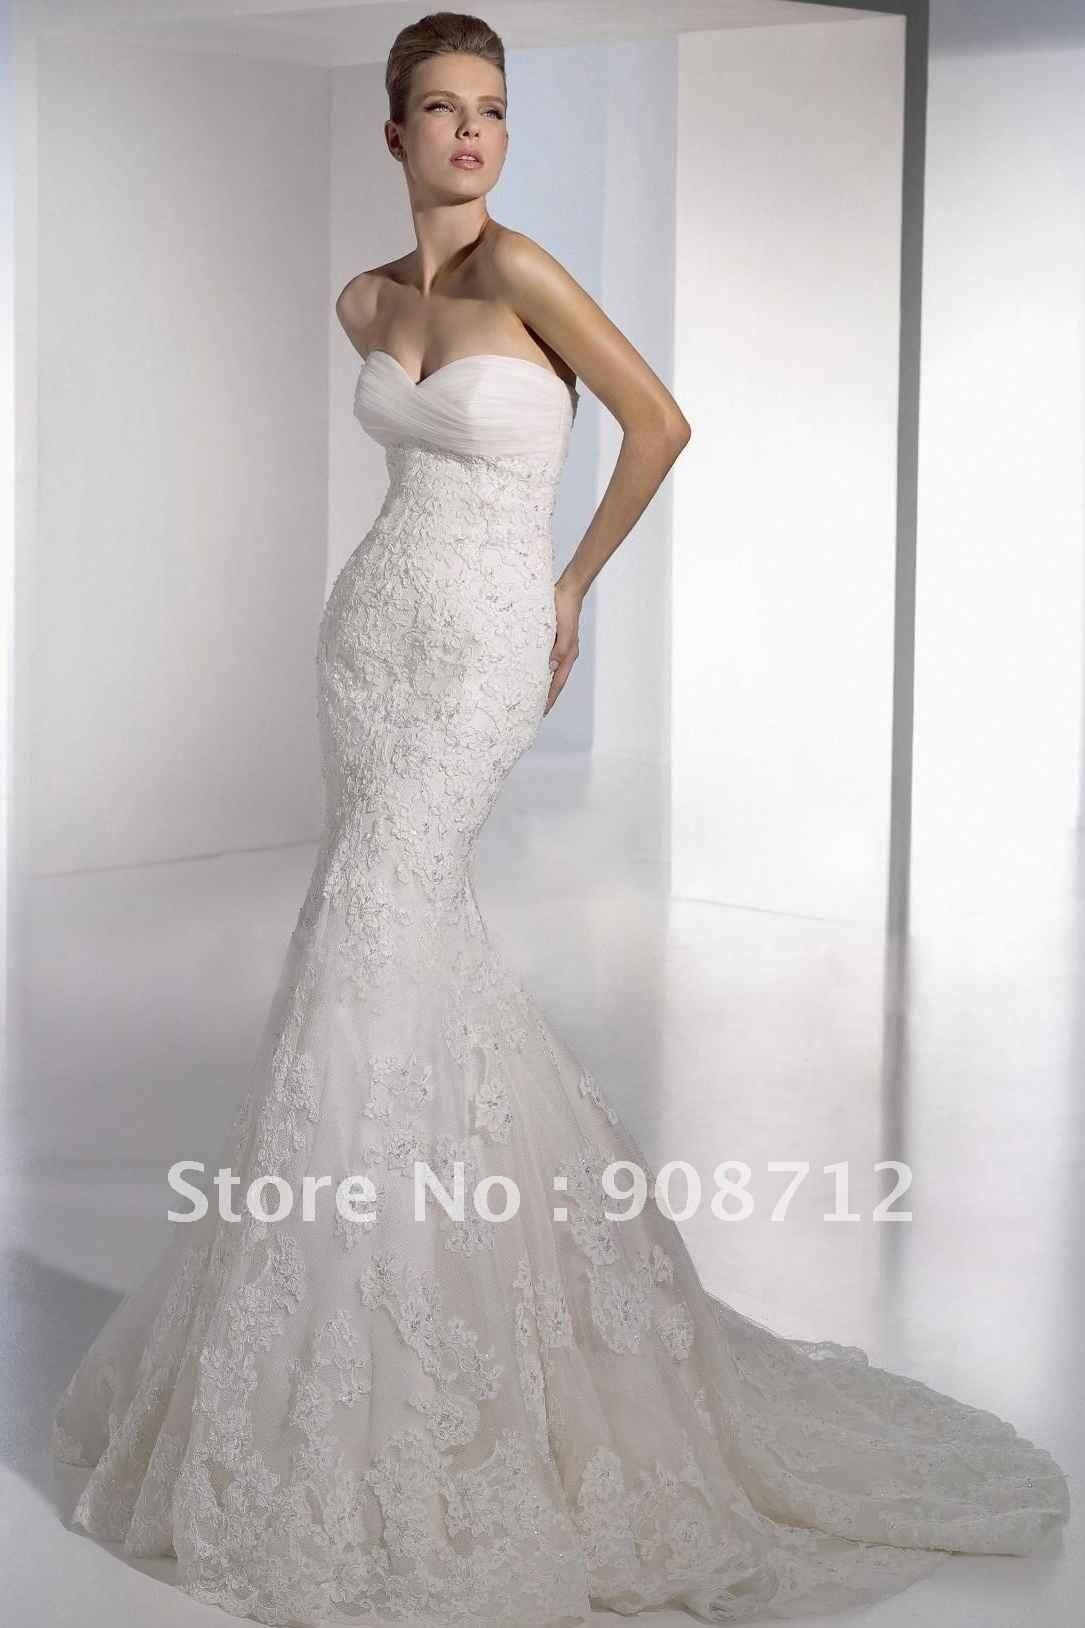 Strapless Mermaid Lace Wedding Dress